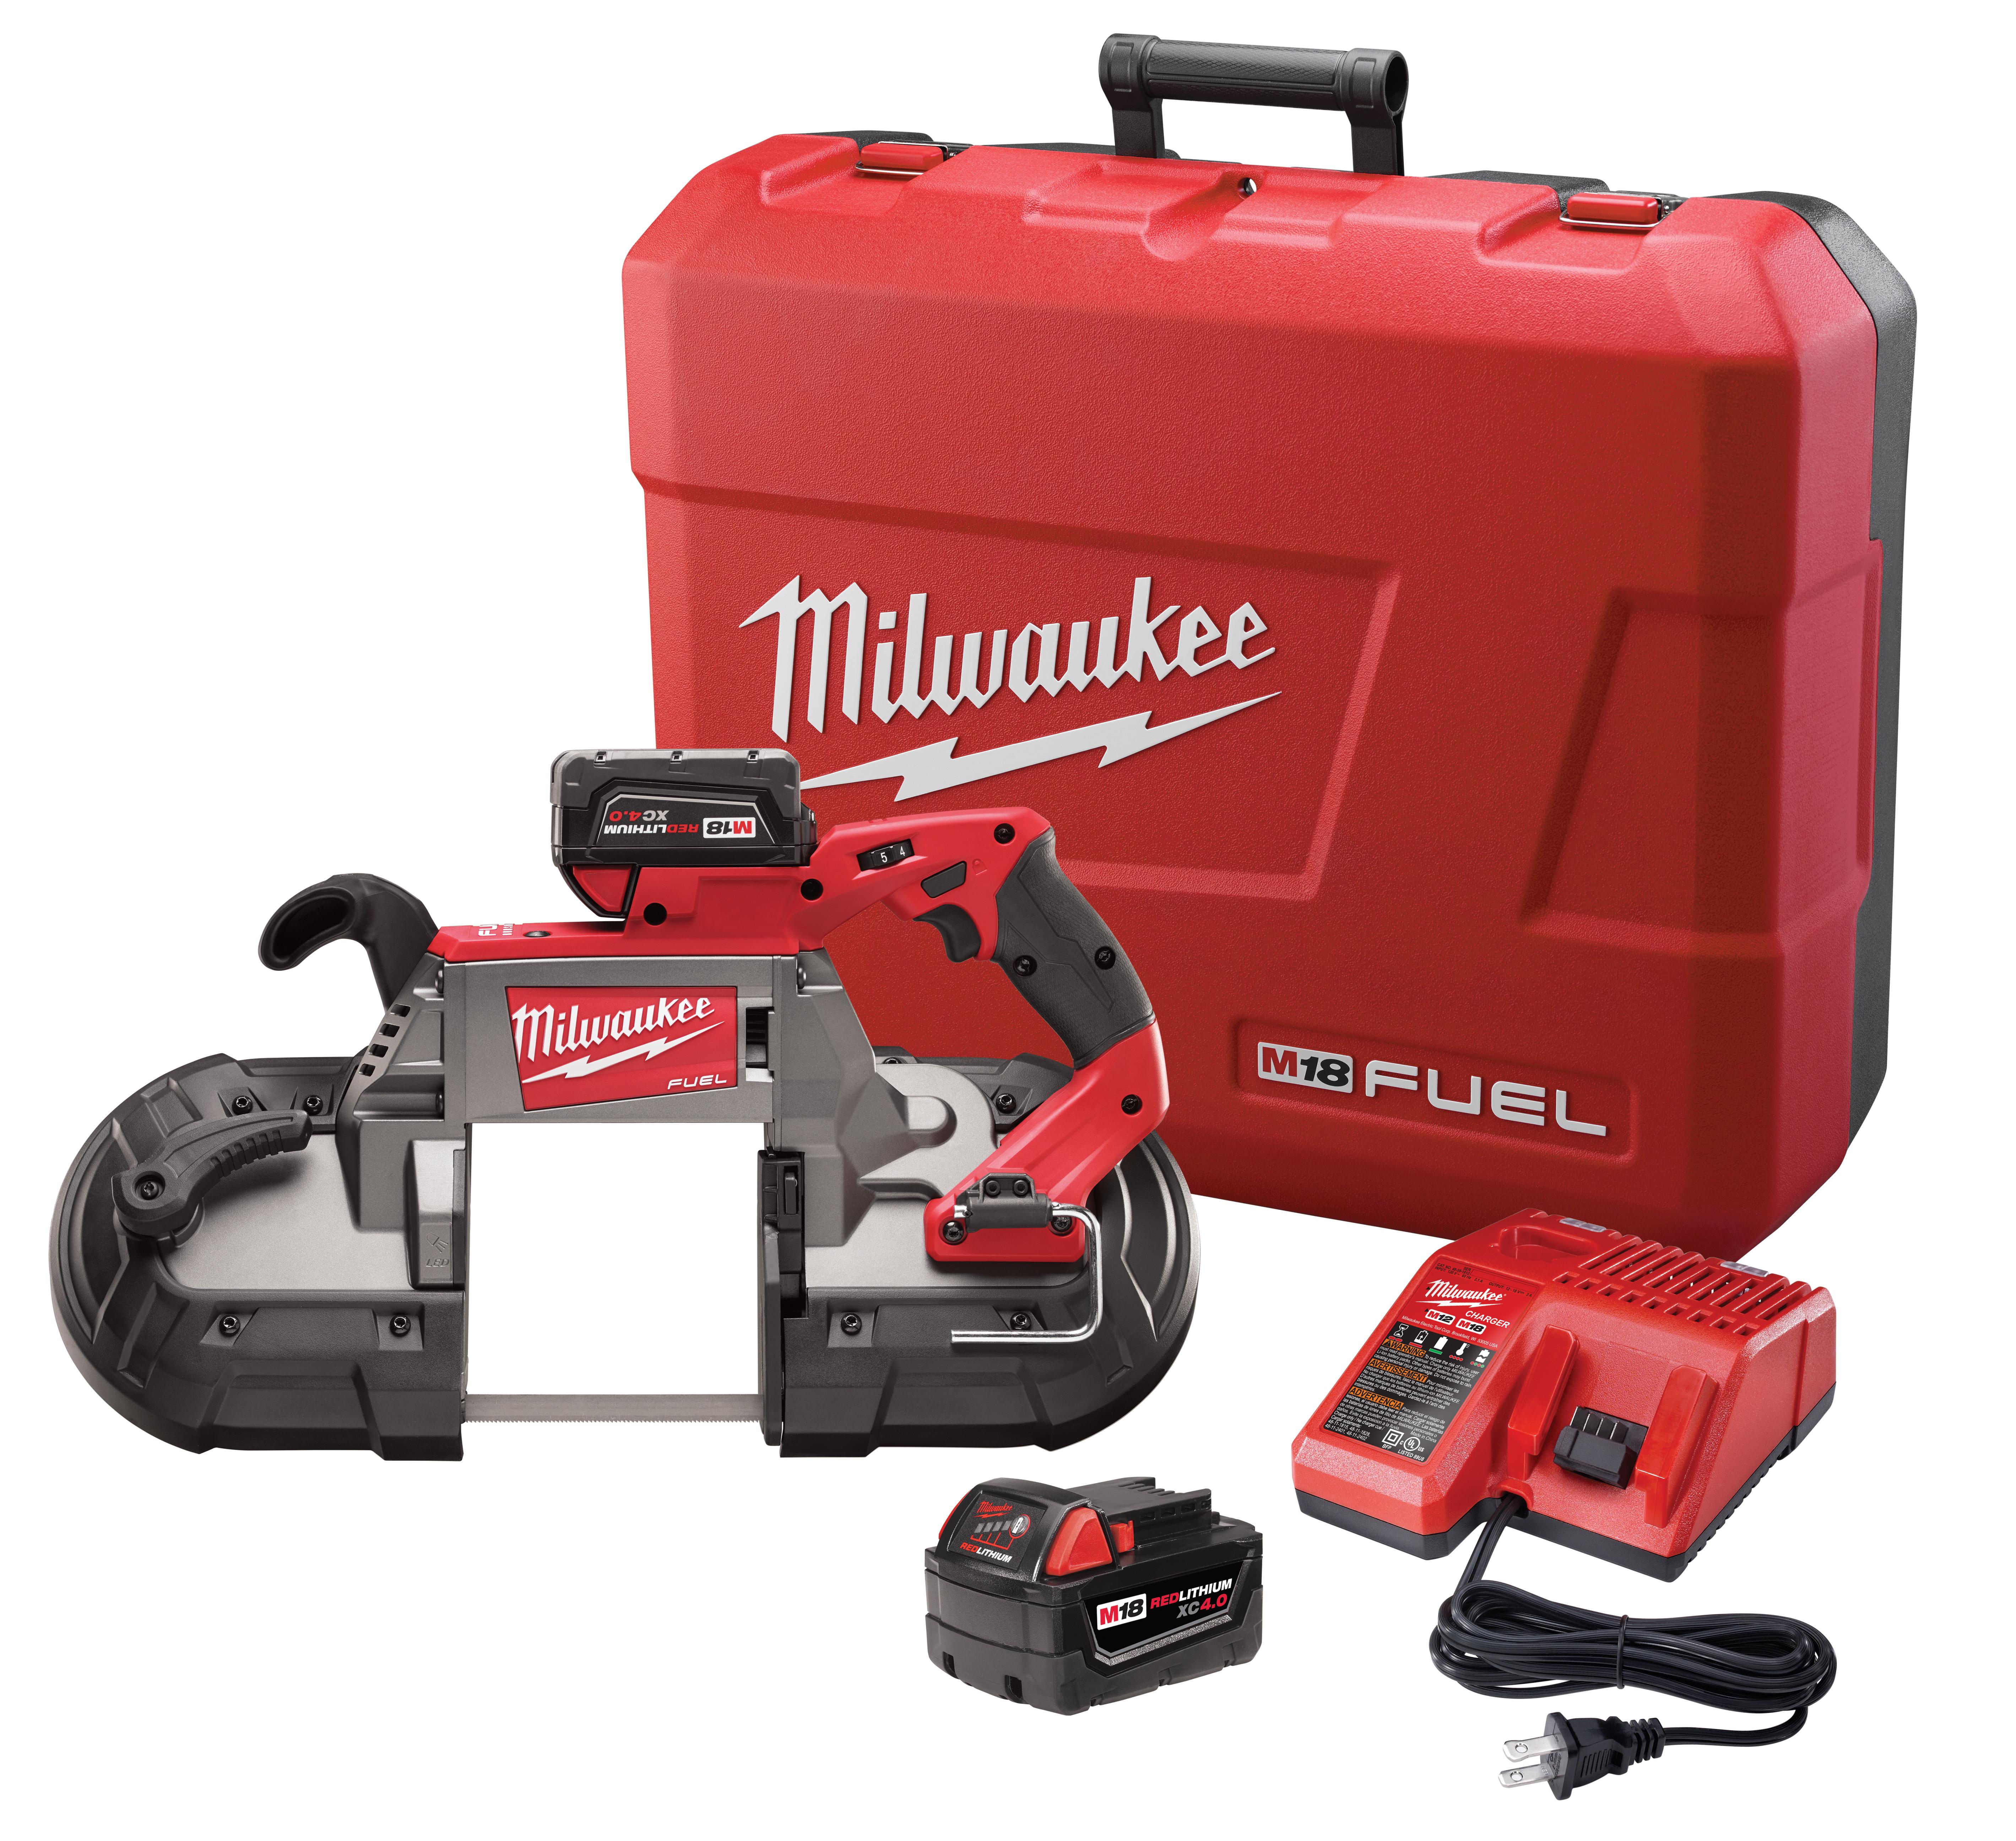 Milwaukee 2729-22 M18 FUEL™ Deep Cut Band Saw - 2 Battery Kit